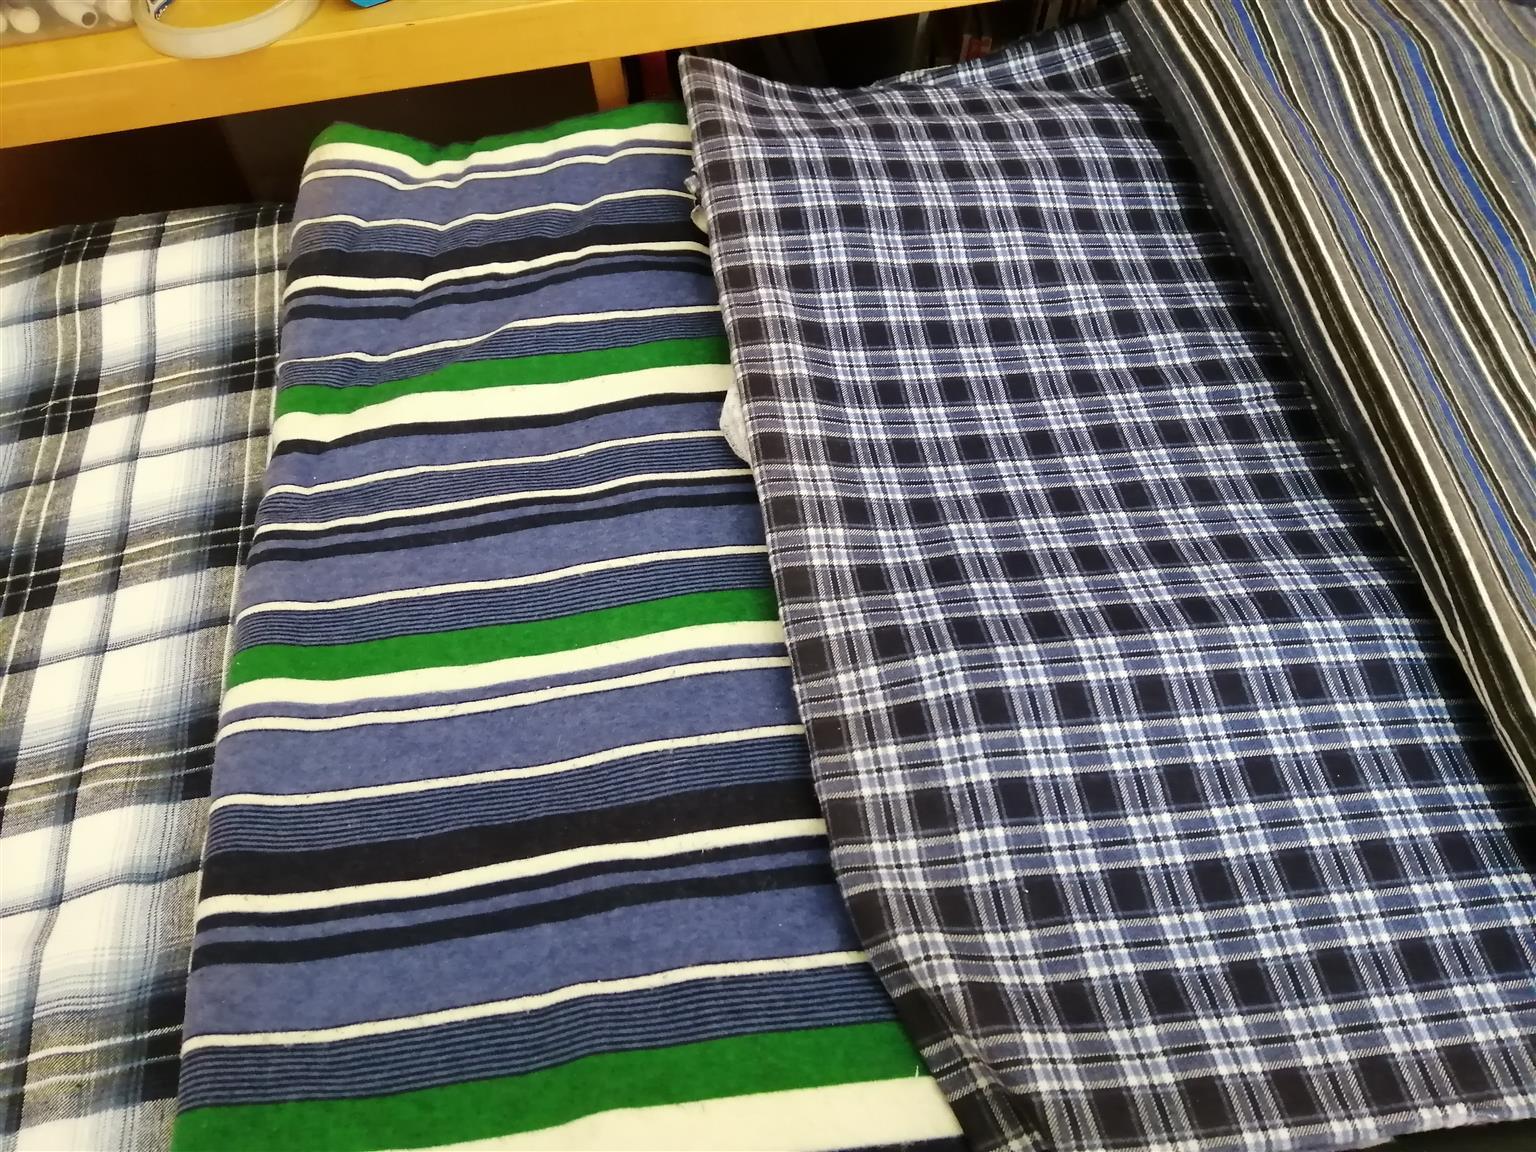 Meters of flannel material.